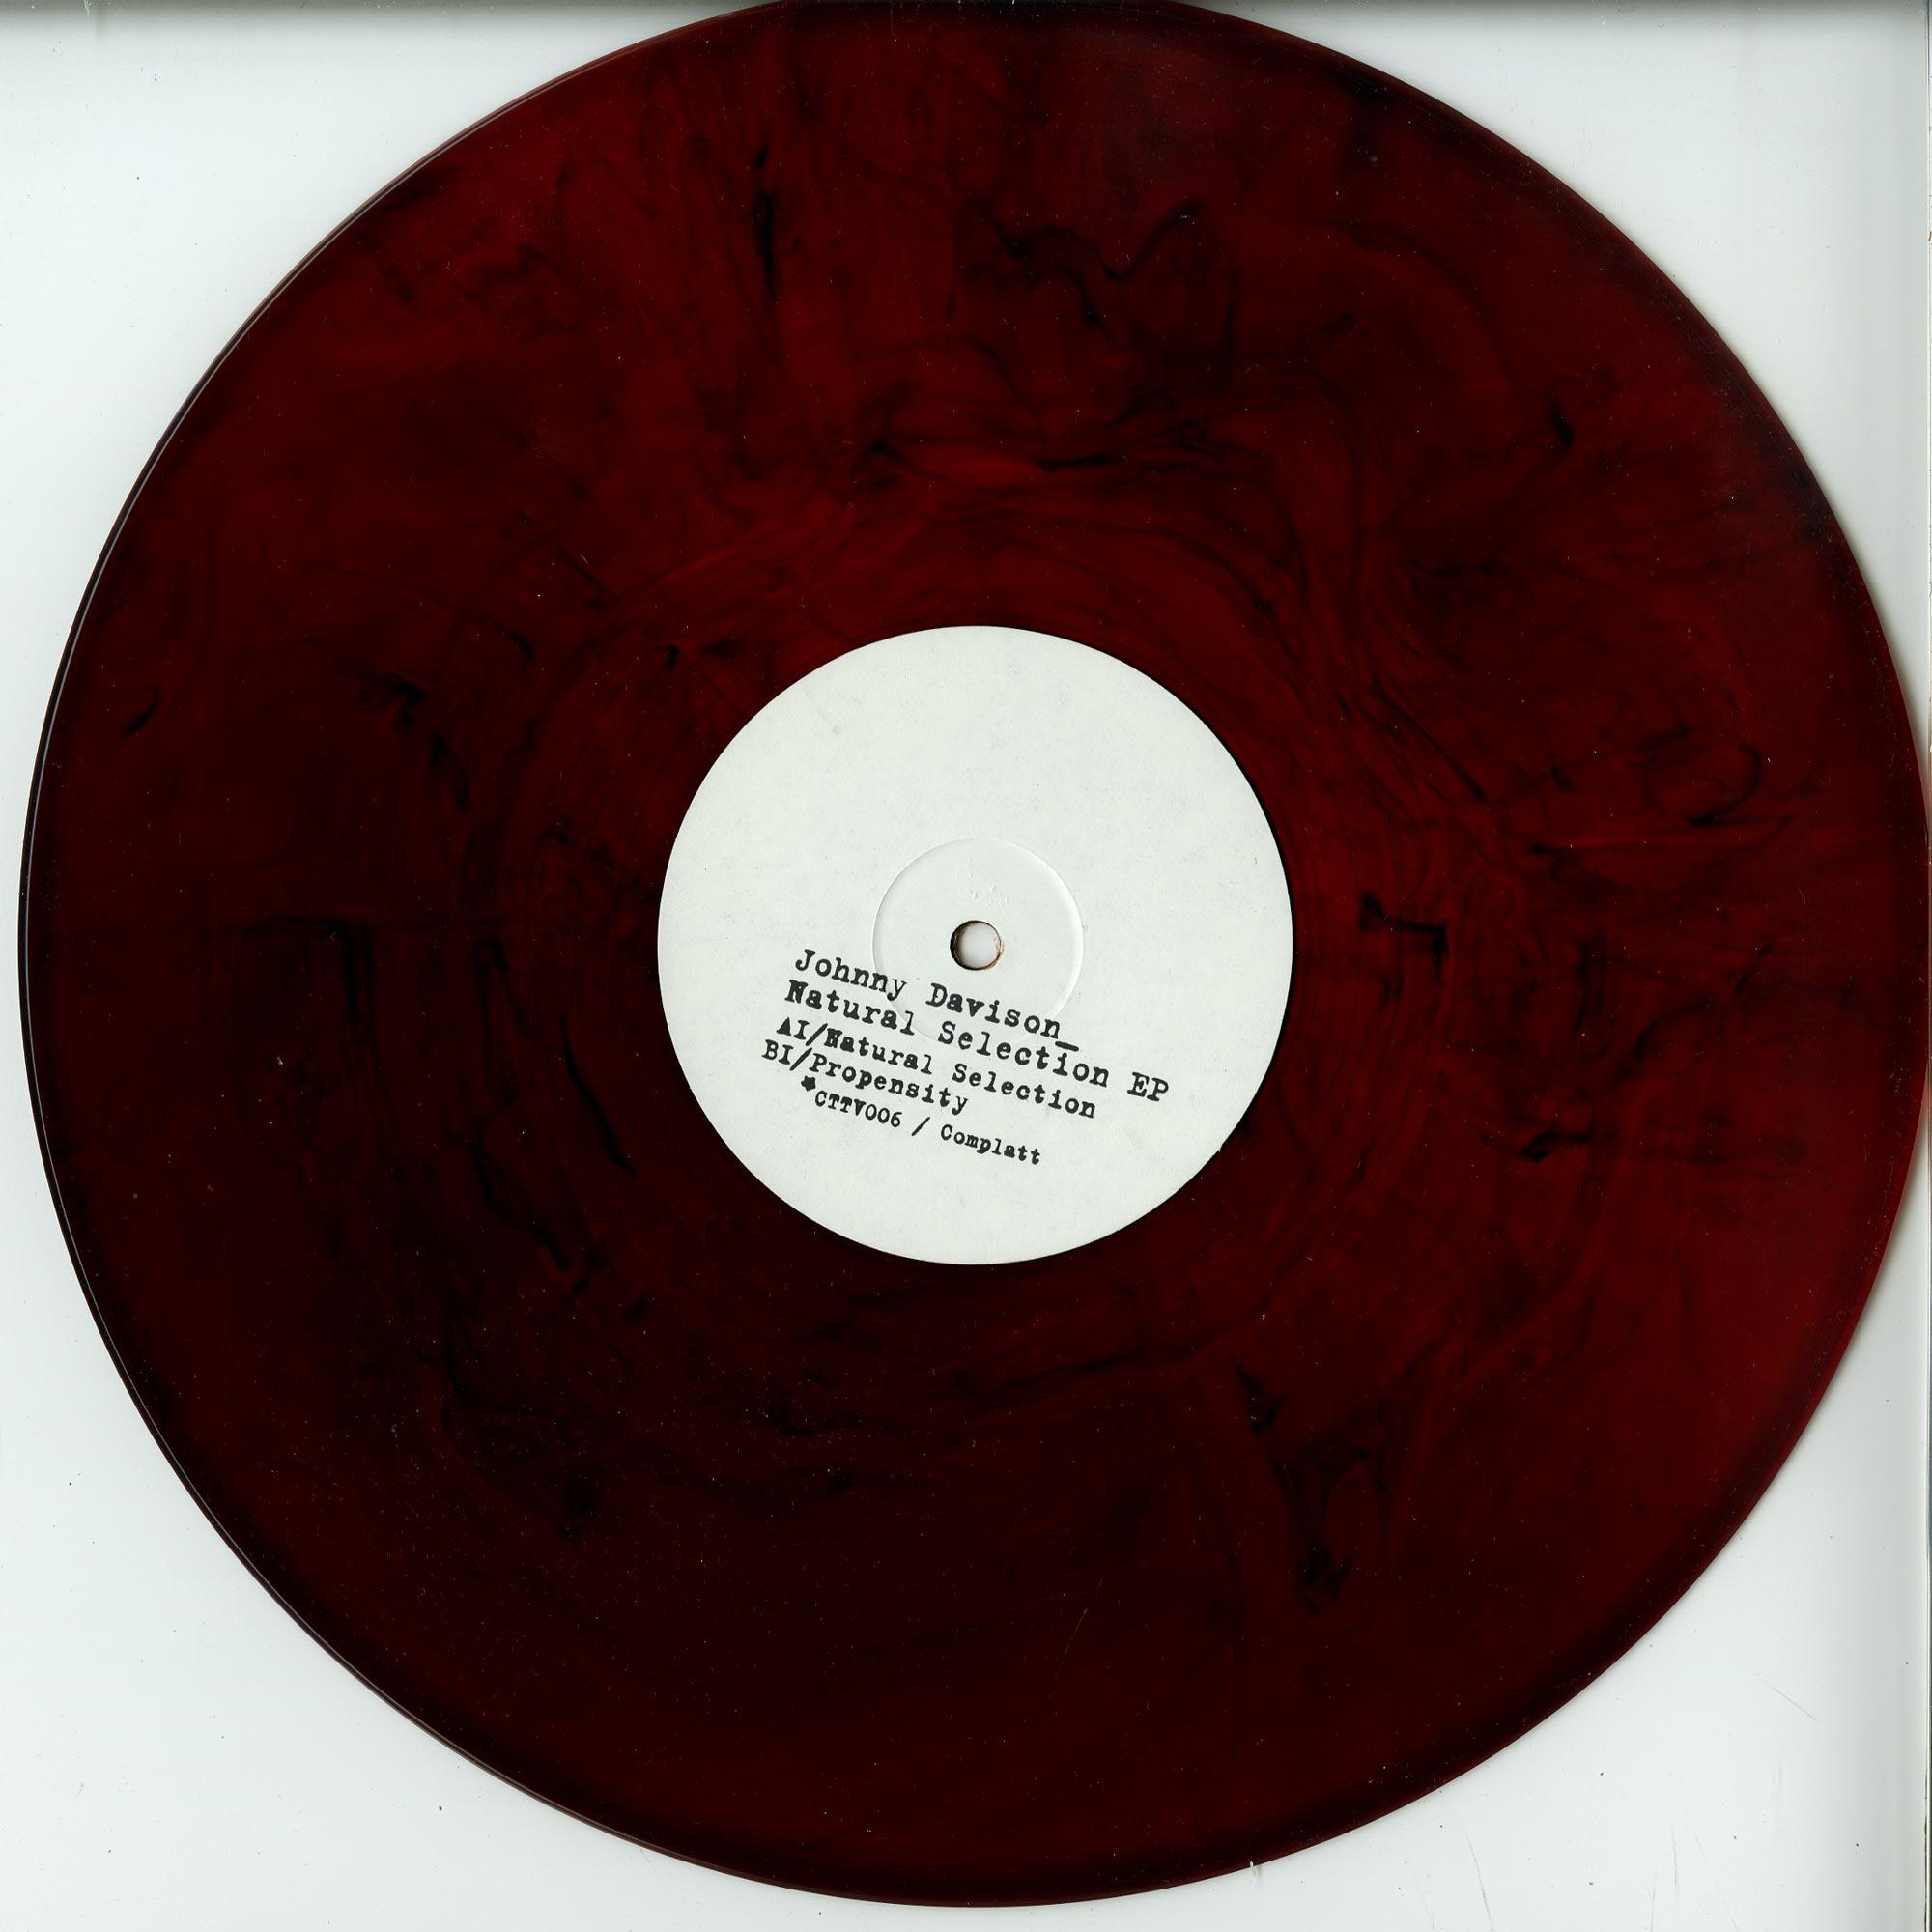 Johnny Davison - NATURAL SELECTION EP